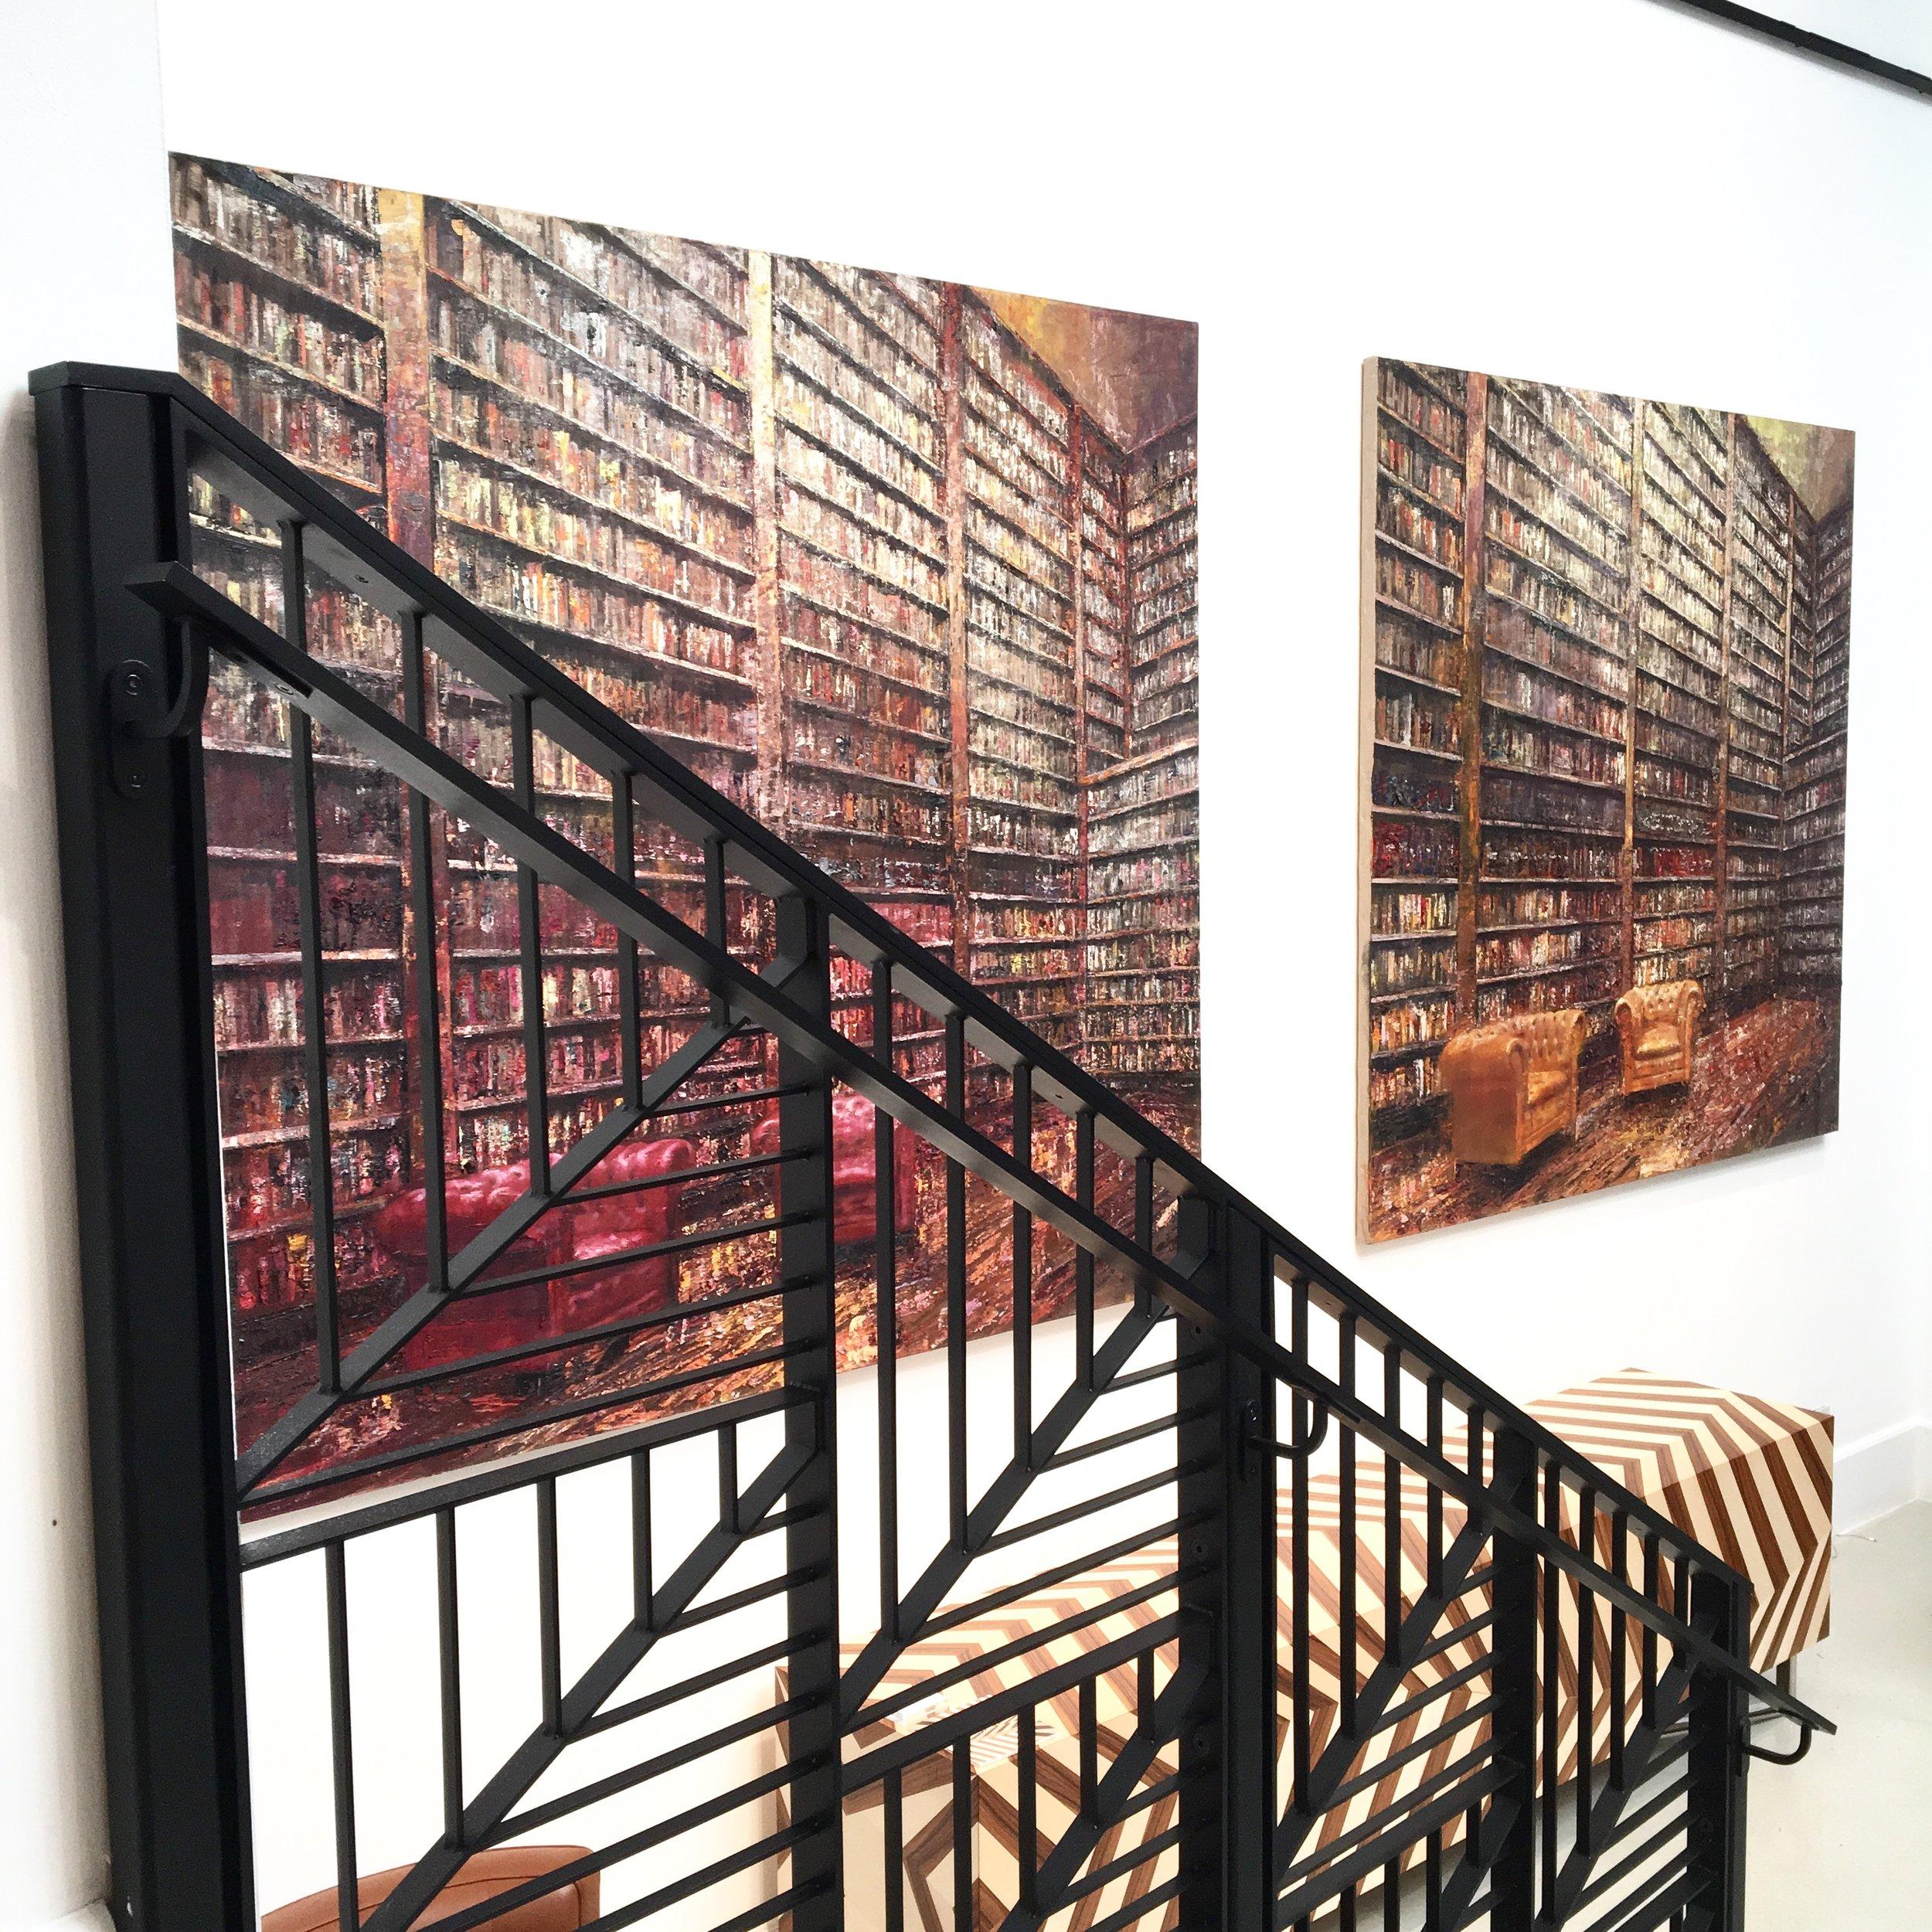 Massimo-Giannoni-Exhibition-Photo-4-Linley-London-Ransom-Art-Collaboration.jpg